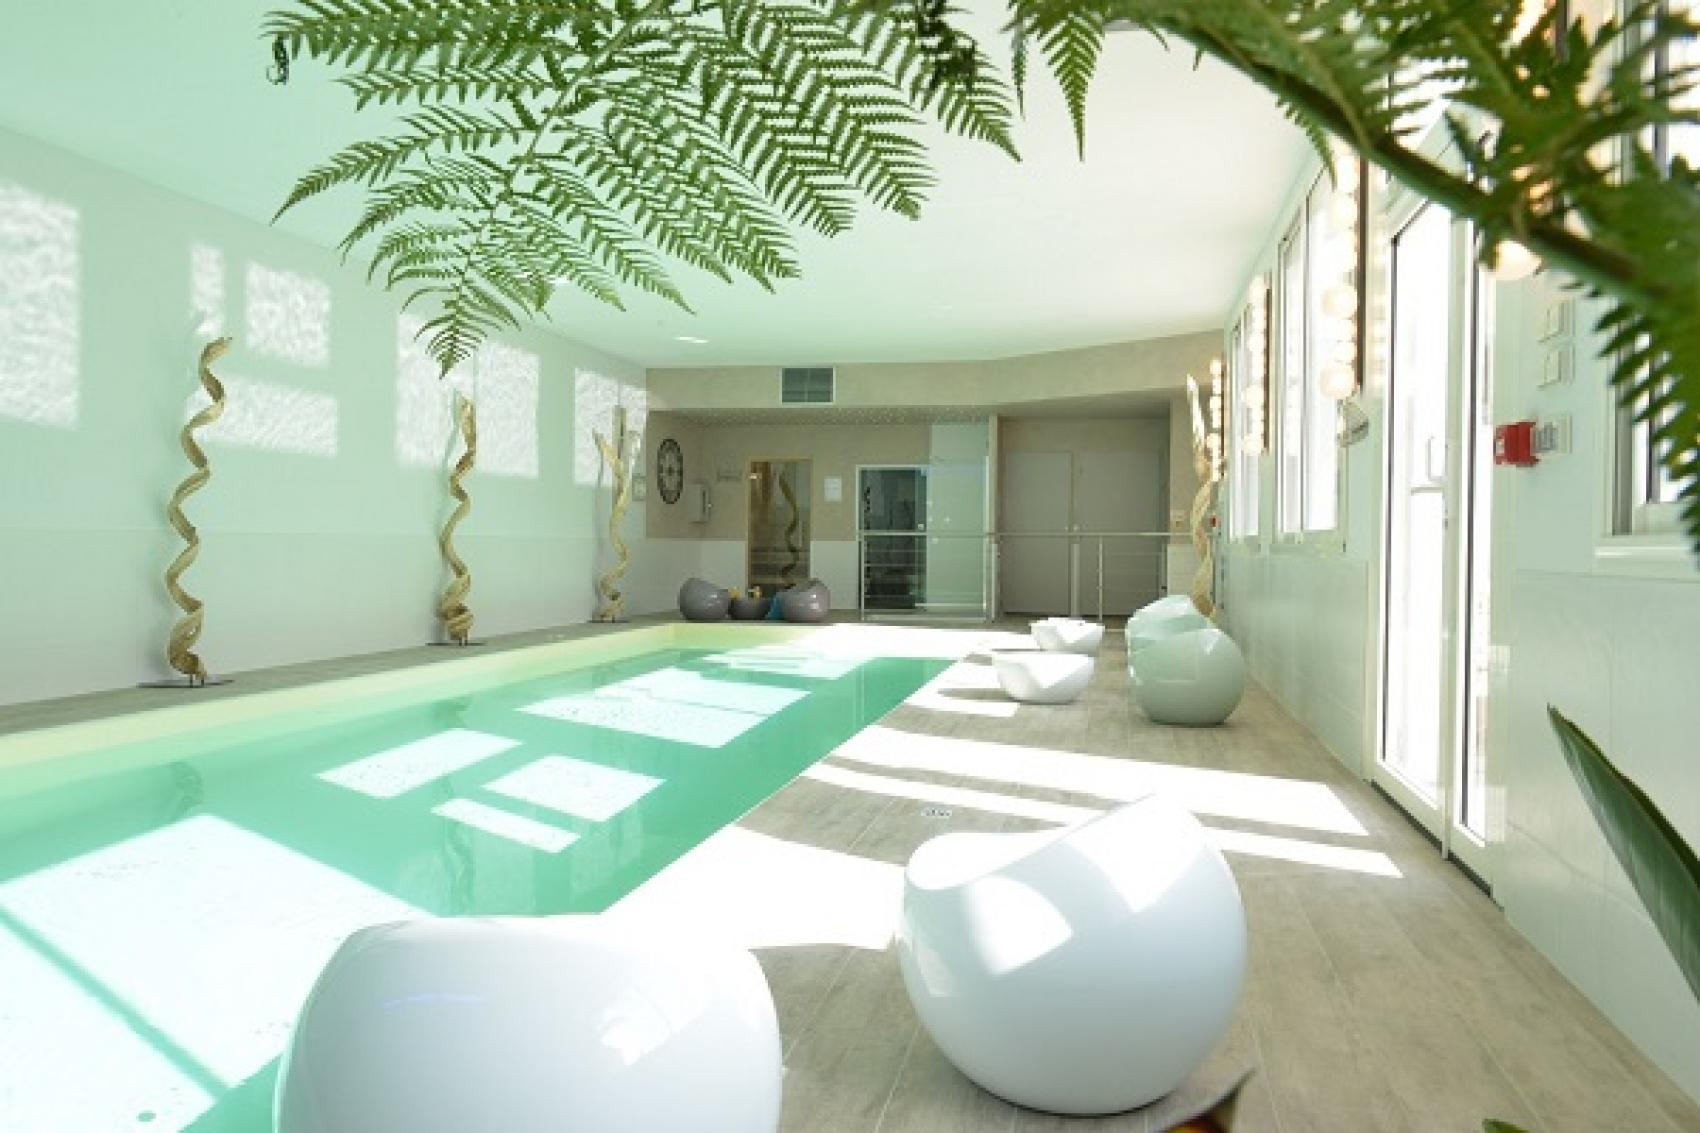 Le grand h tel des bains spa piscine int rieure for Fouras grand hotel des bains